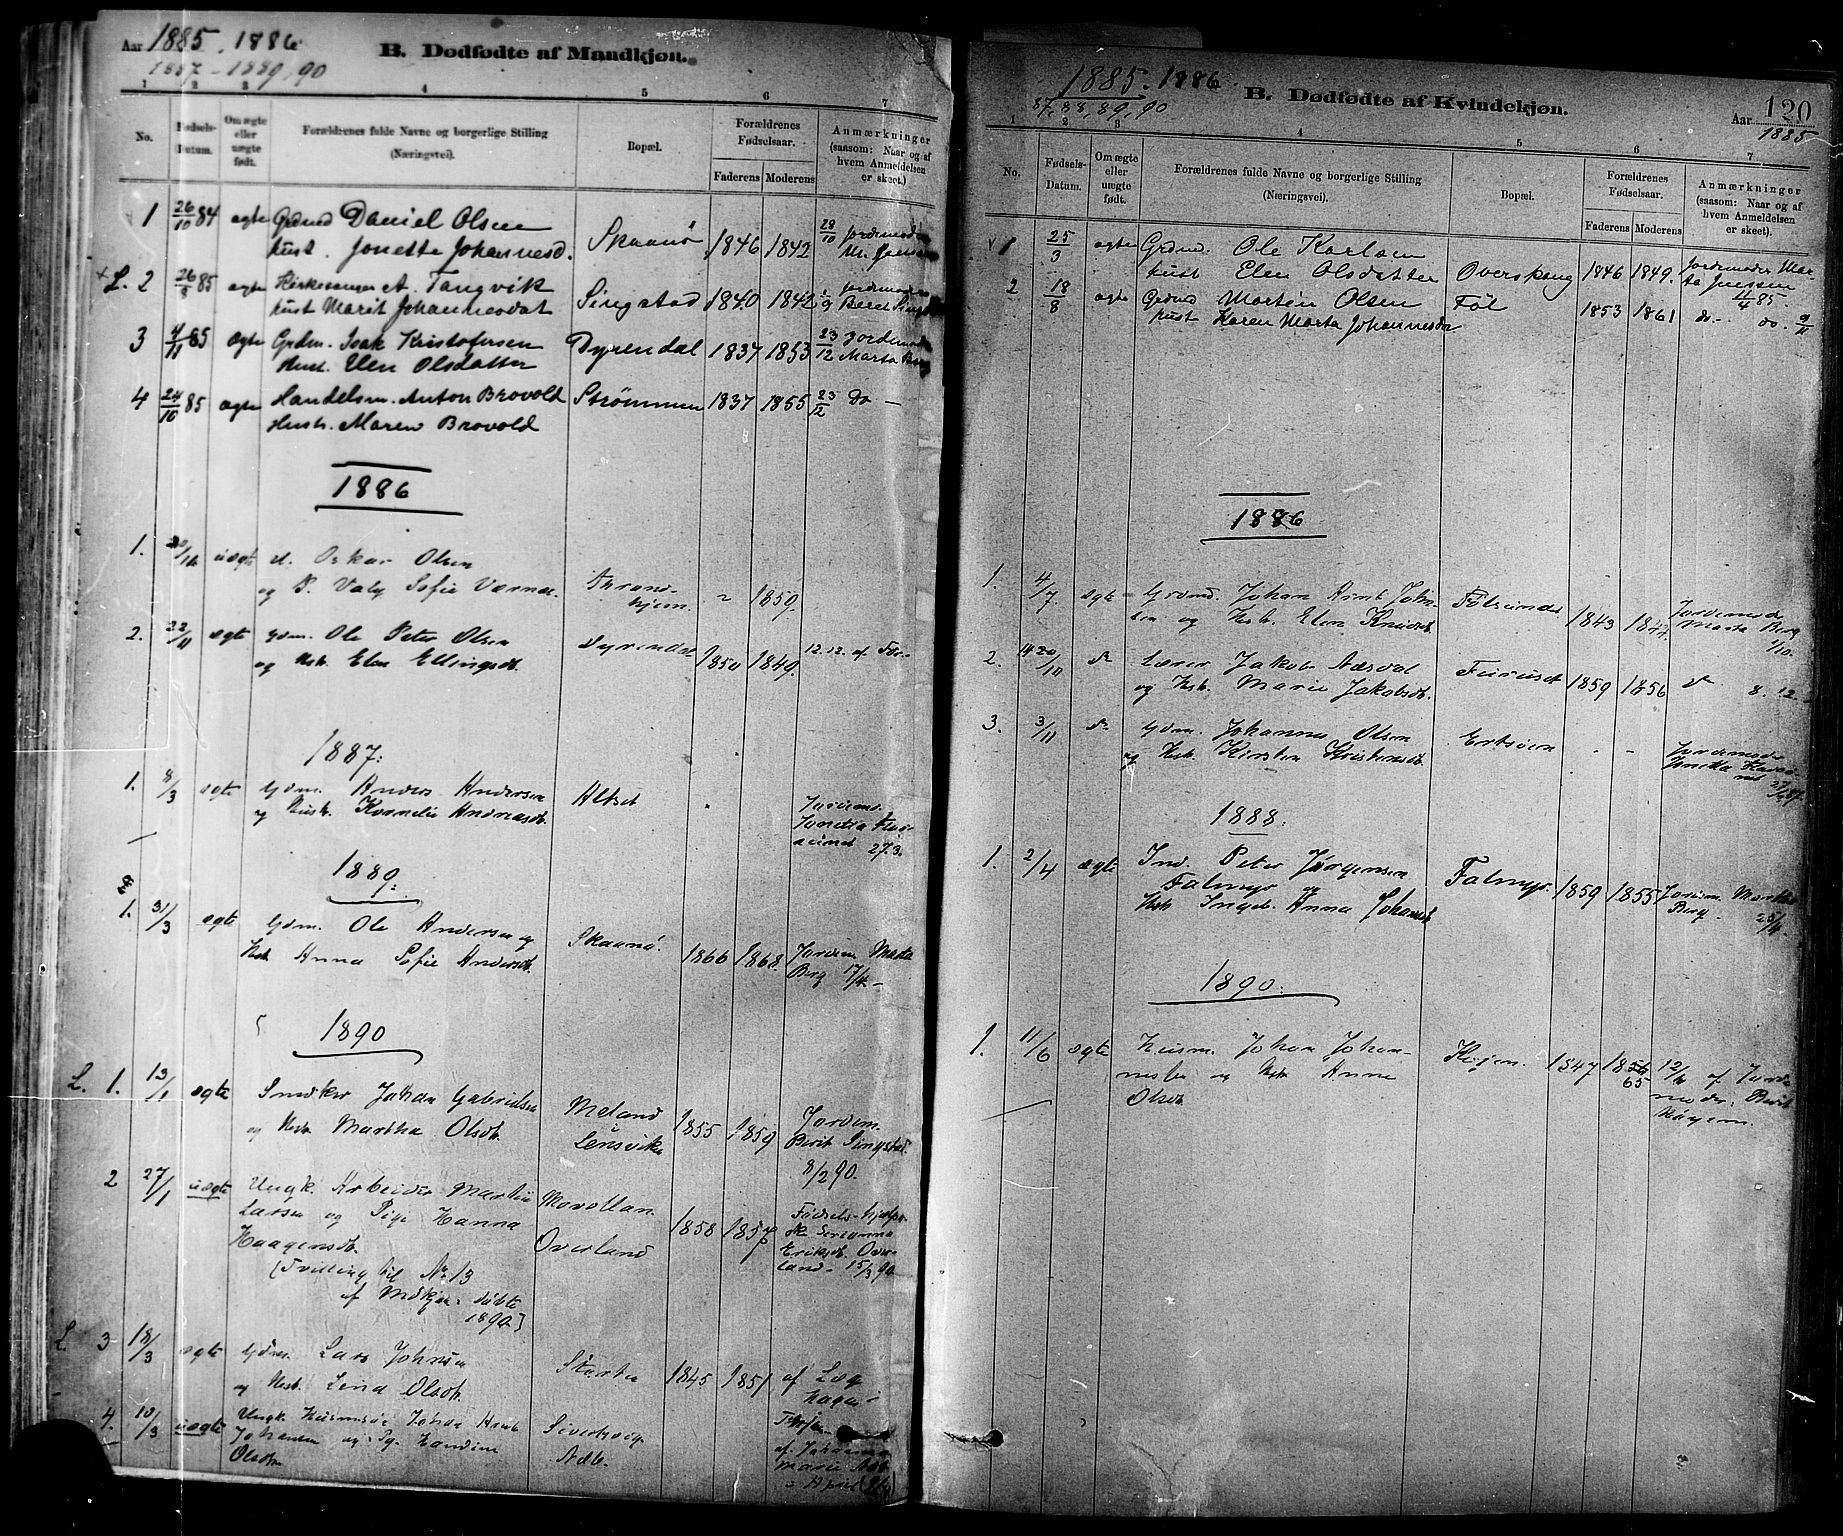 SAT, Ministerialprotokoller, klokkerbøker og fødselsregistre - Sør-Trøndelag, 647/L0634: Parish register (official) no. 647A01, 1885-1896, p. 120